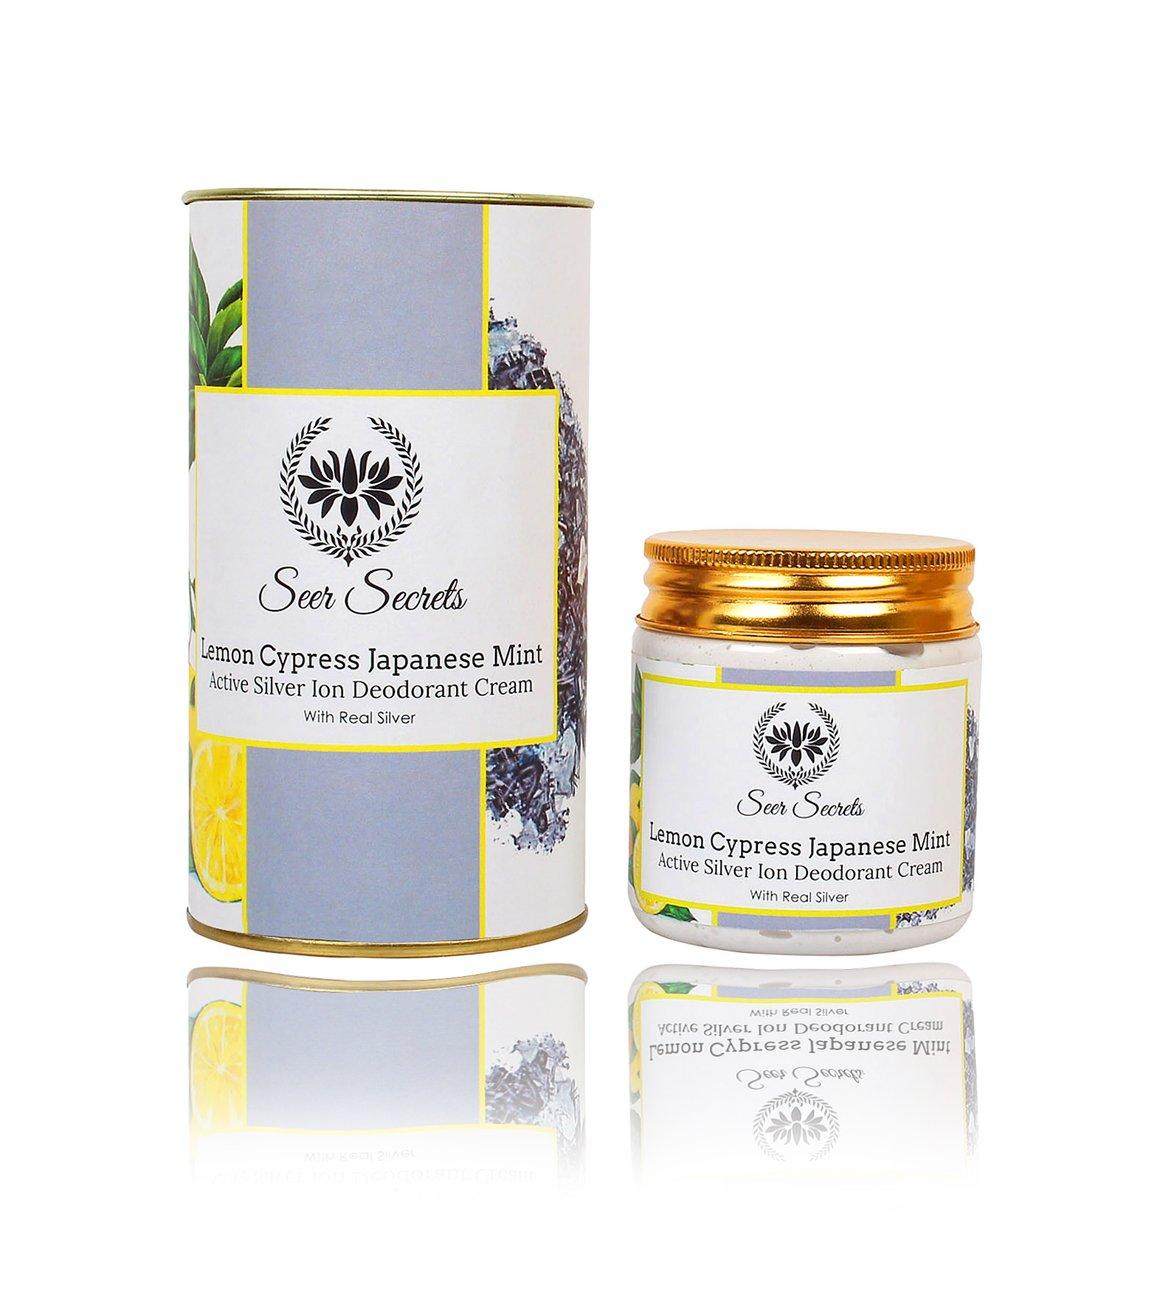 Seer Secrets Lemon Cypress Japanese Mint Active Silver Ion Deodorant Cream Whitening & Bleaching (100Gms) product image